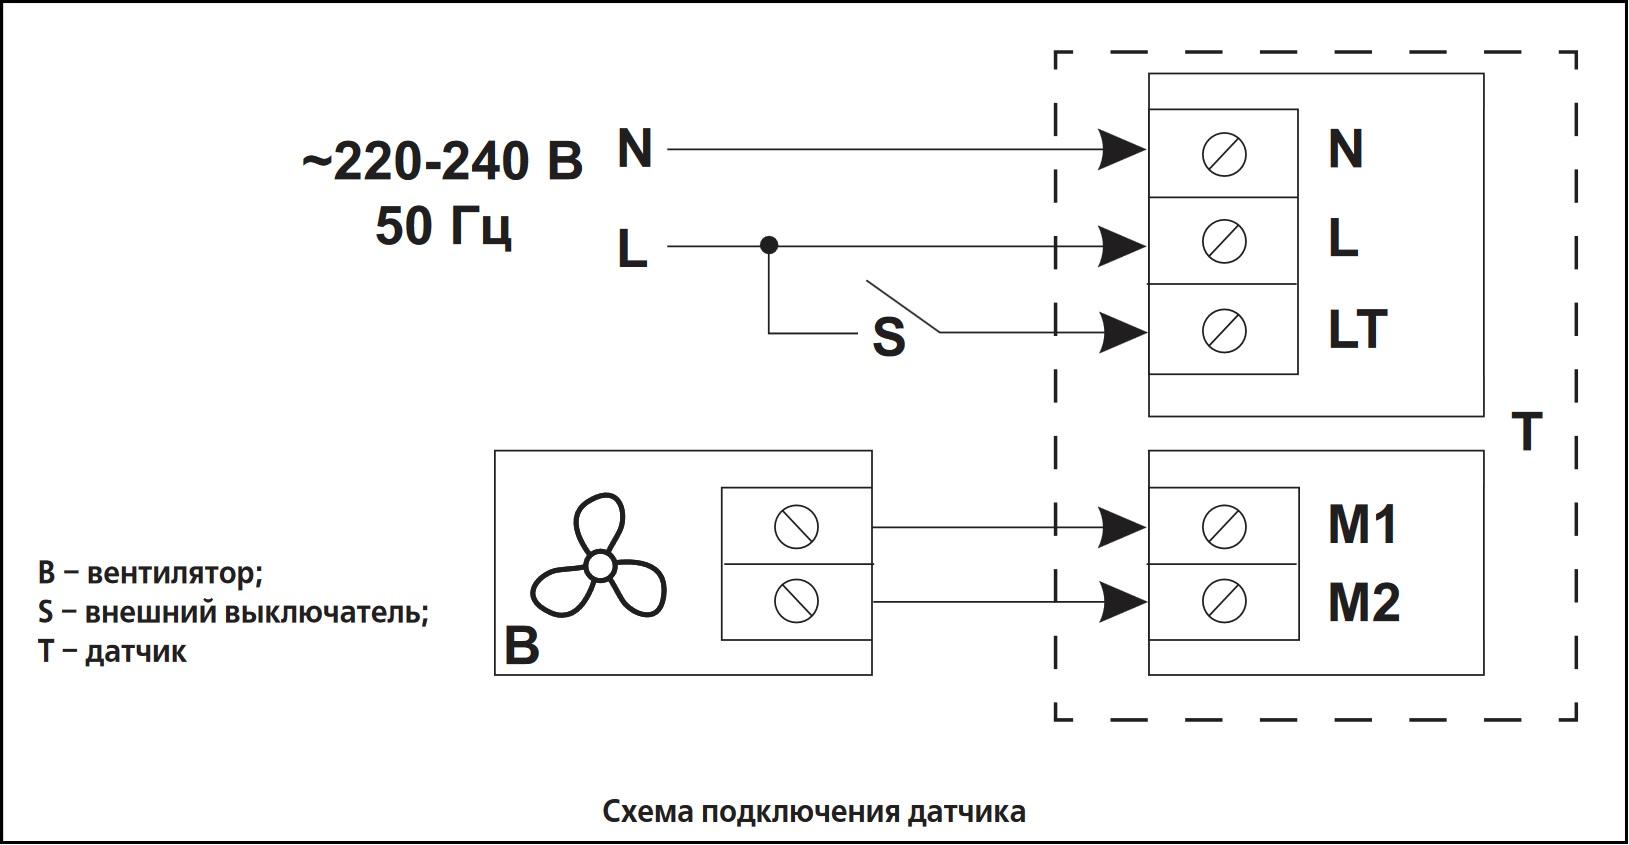 Схема подключения датчика ВЕНТС Т-1,5 Н